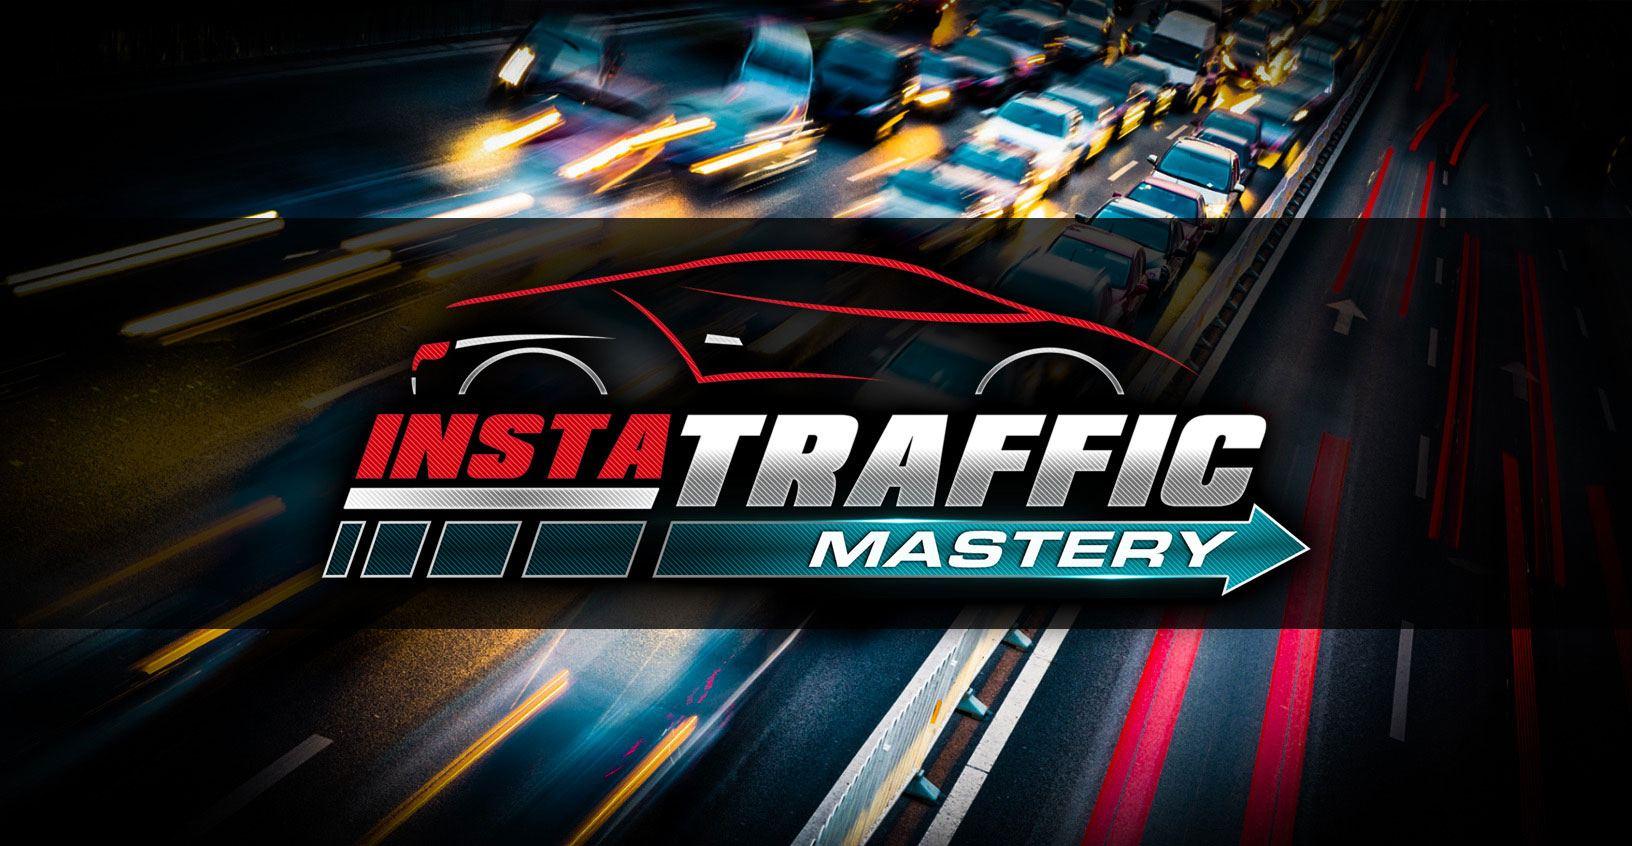 Instagram营销大师总计超过1.5亿粉丝的强大营销能力教你他是如何做到这一切的!(Insta Traffic Mastery )